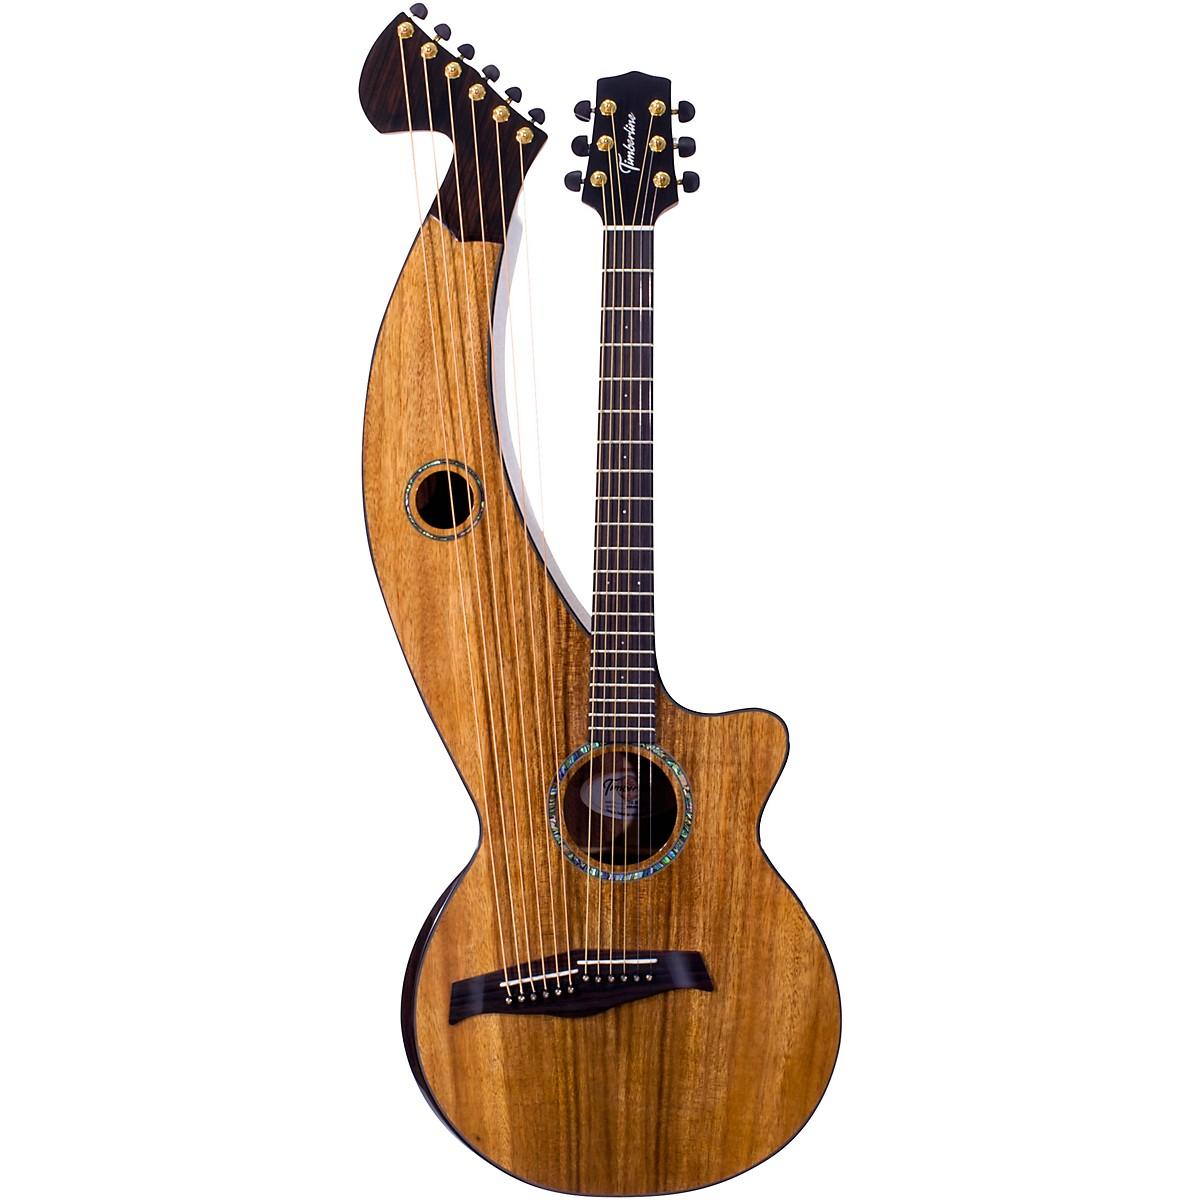 Timberline Guitars T70HGc Solid Silkwood 12-String Cutaway Acoustic Harp Guitar